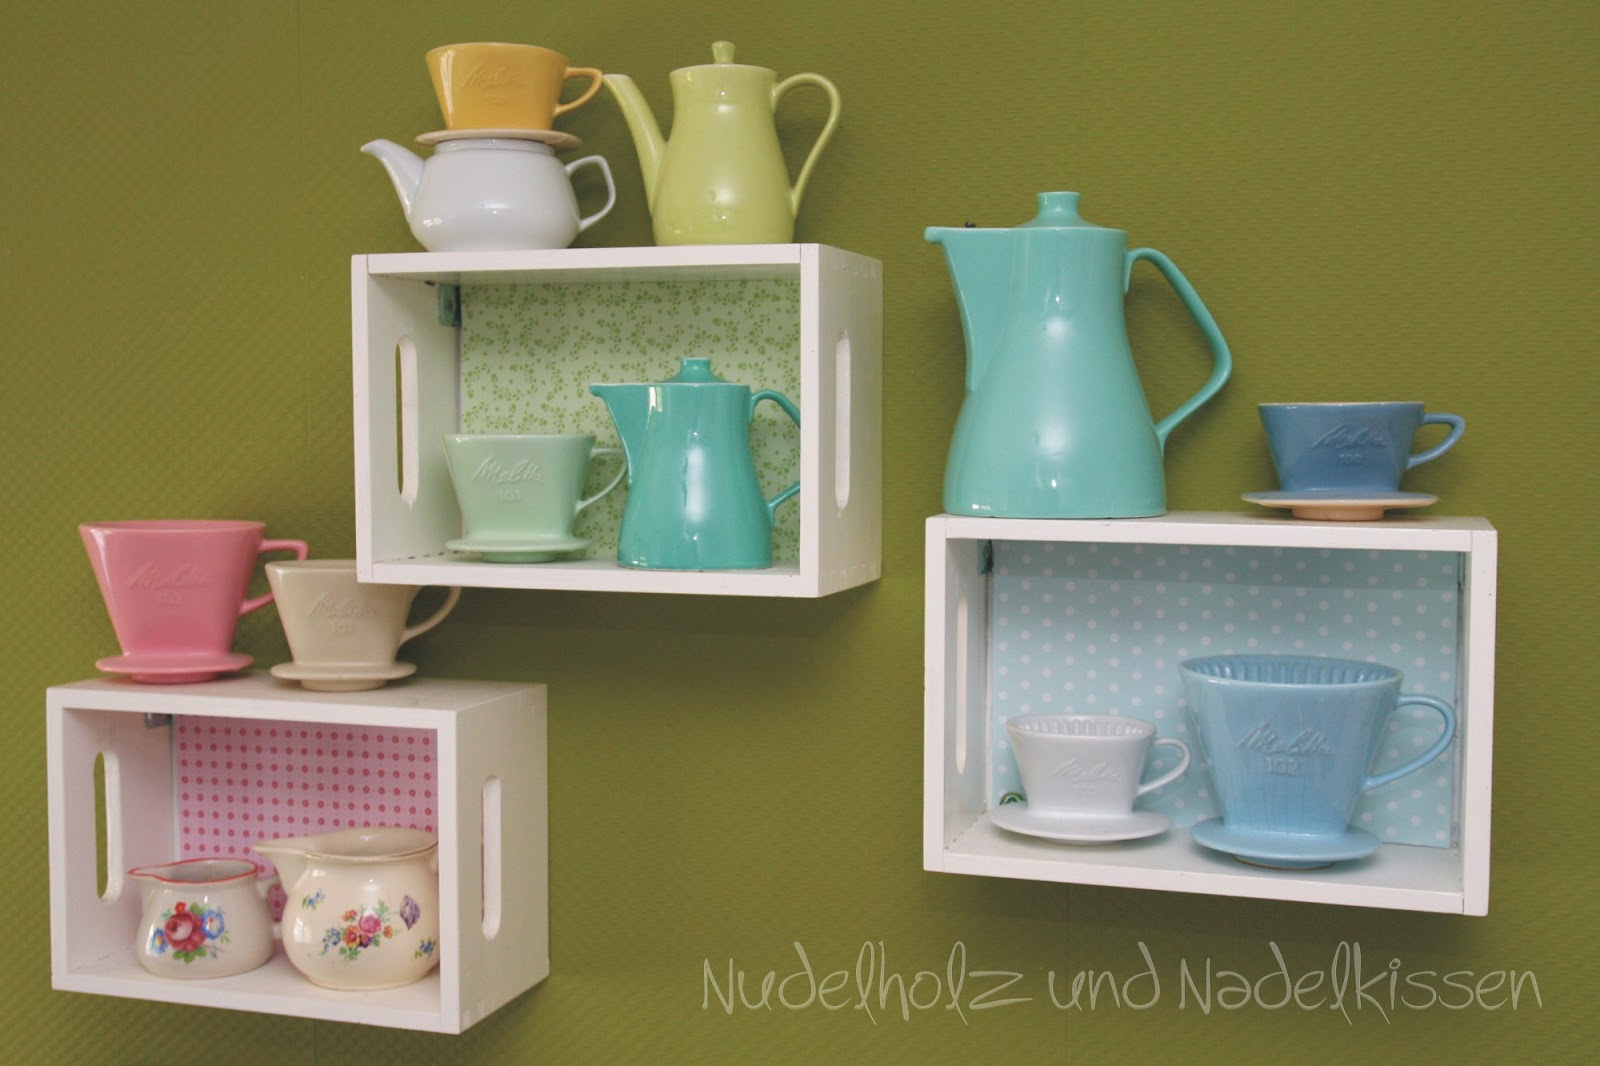 nudelholz und nadelkissen regalboxen. Black Bedroom Furniture Sets. Home Design Ideas